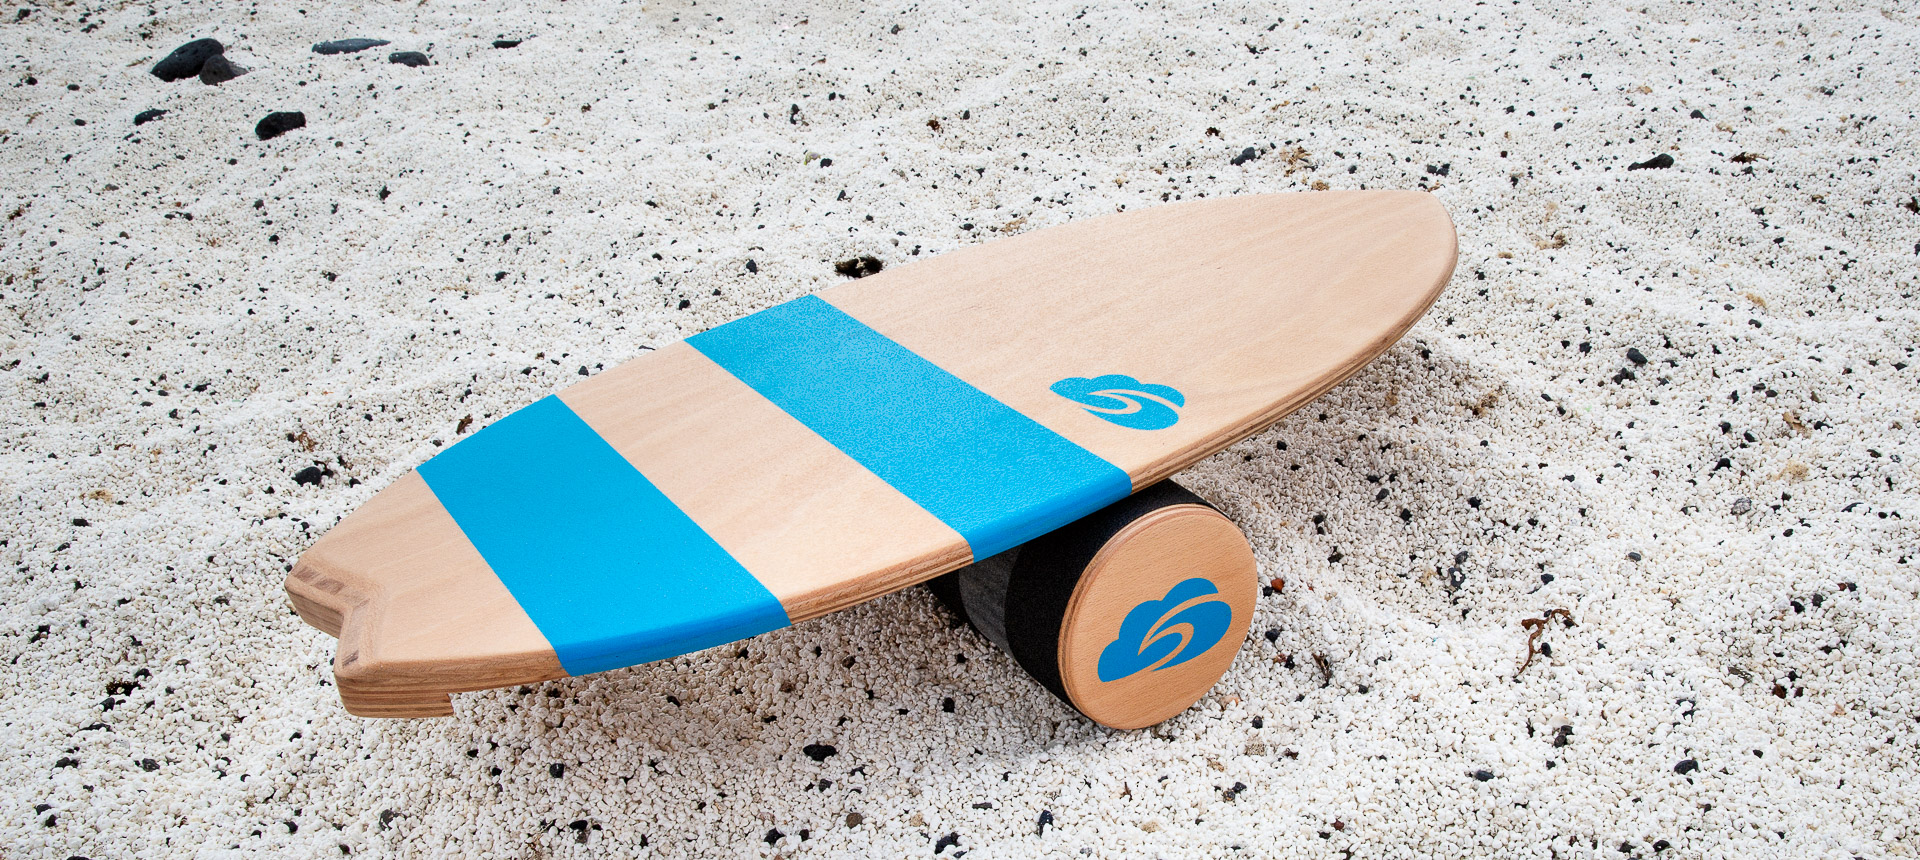 SURF DREAM Balanční deska